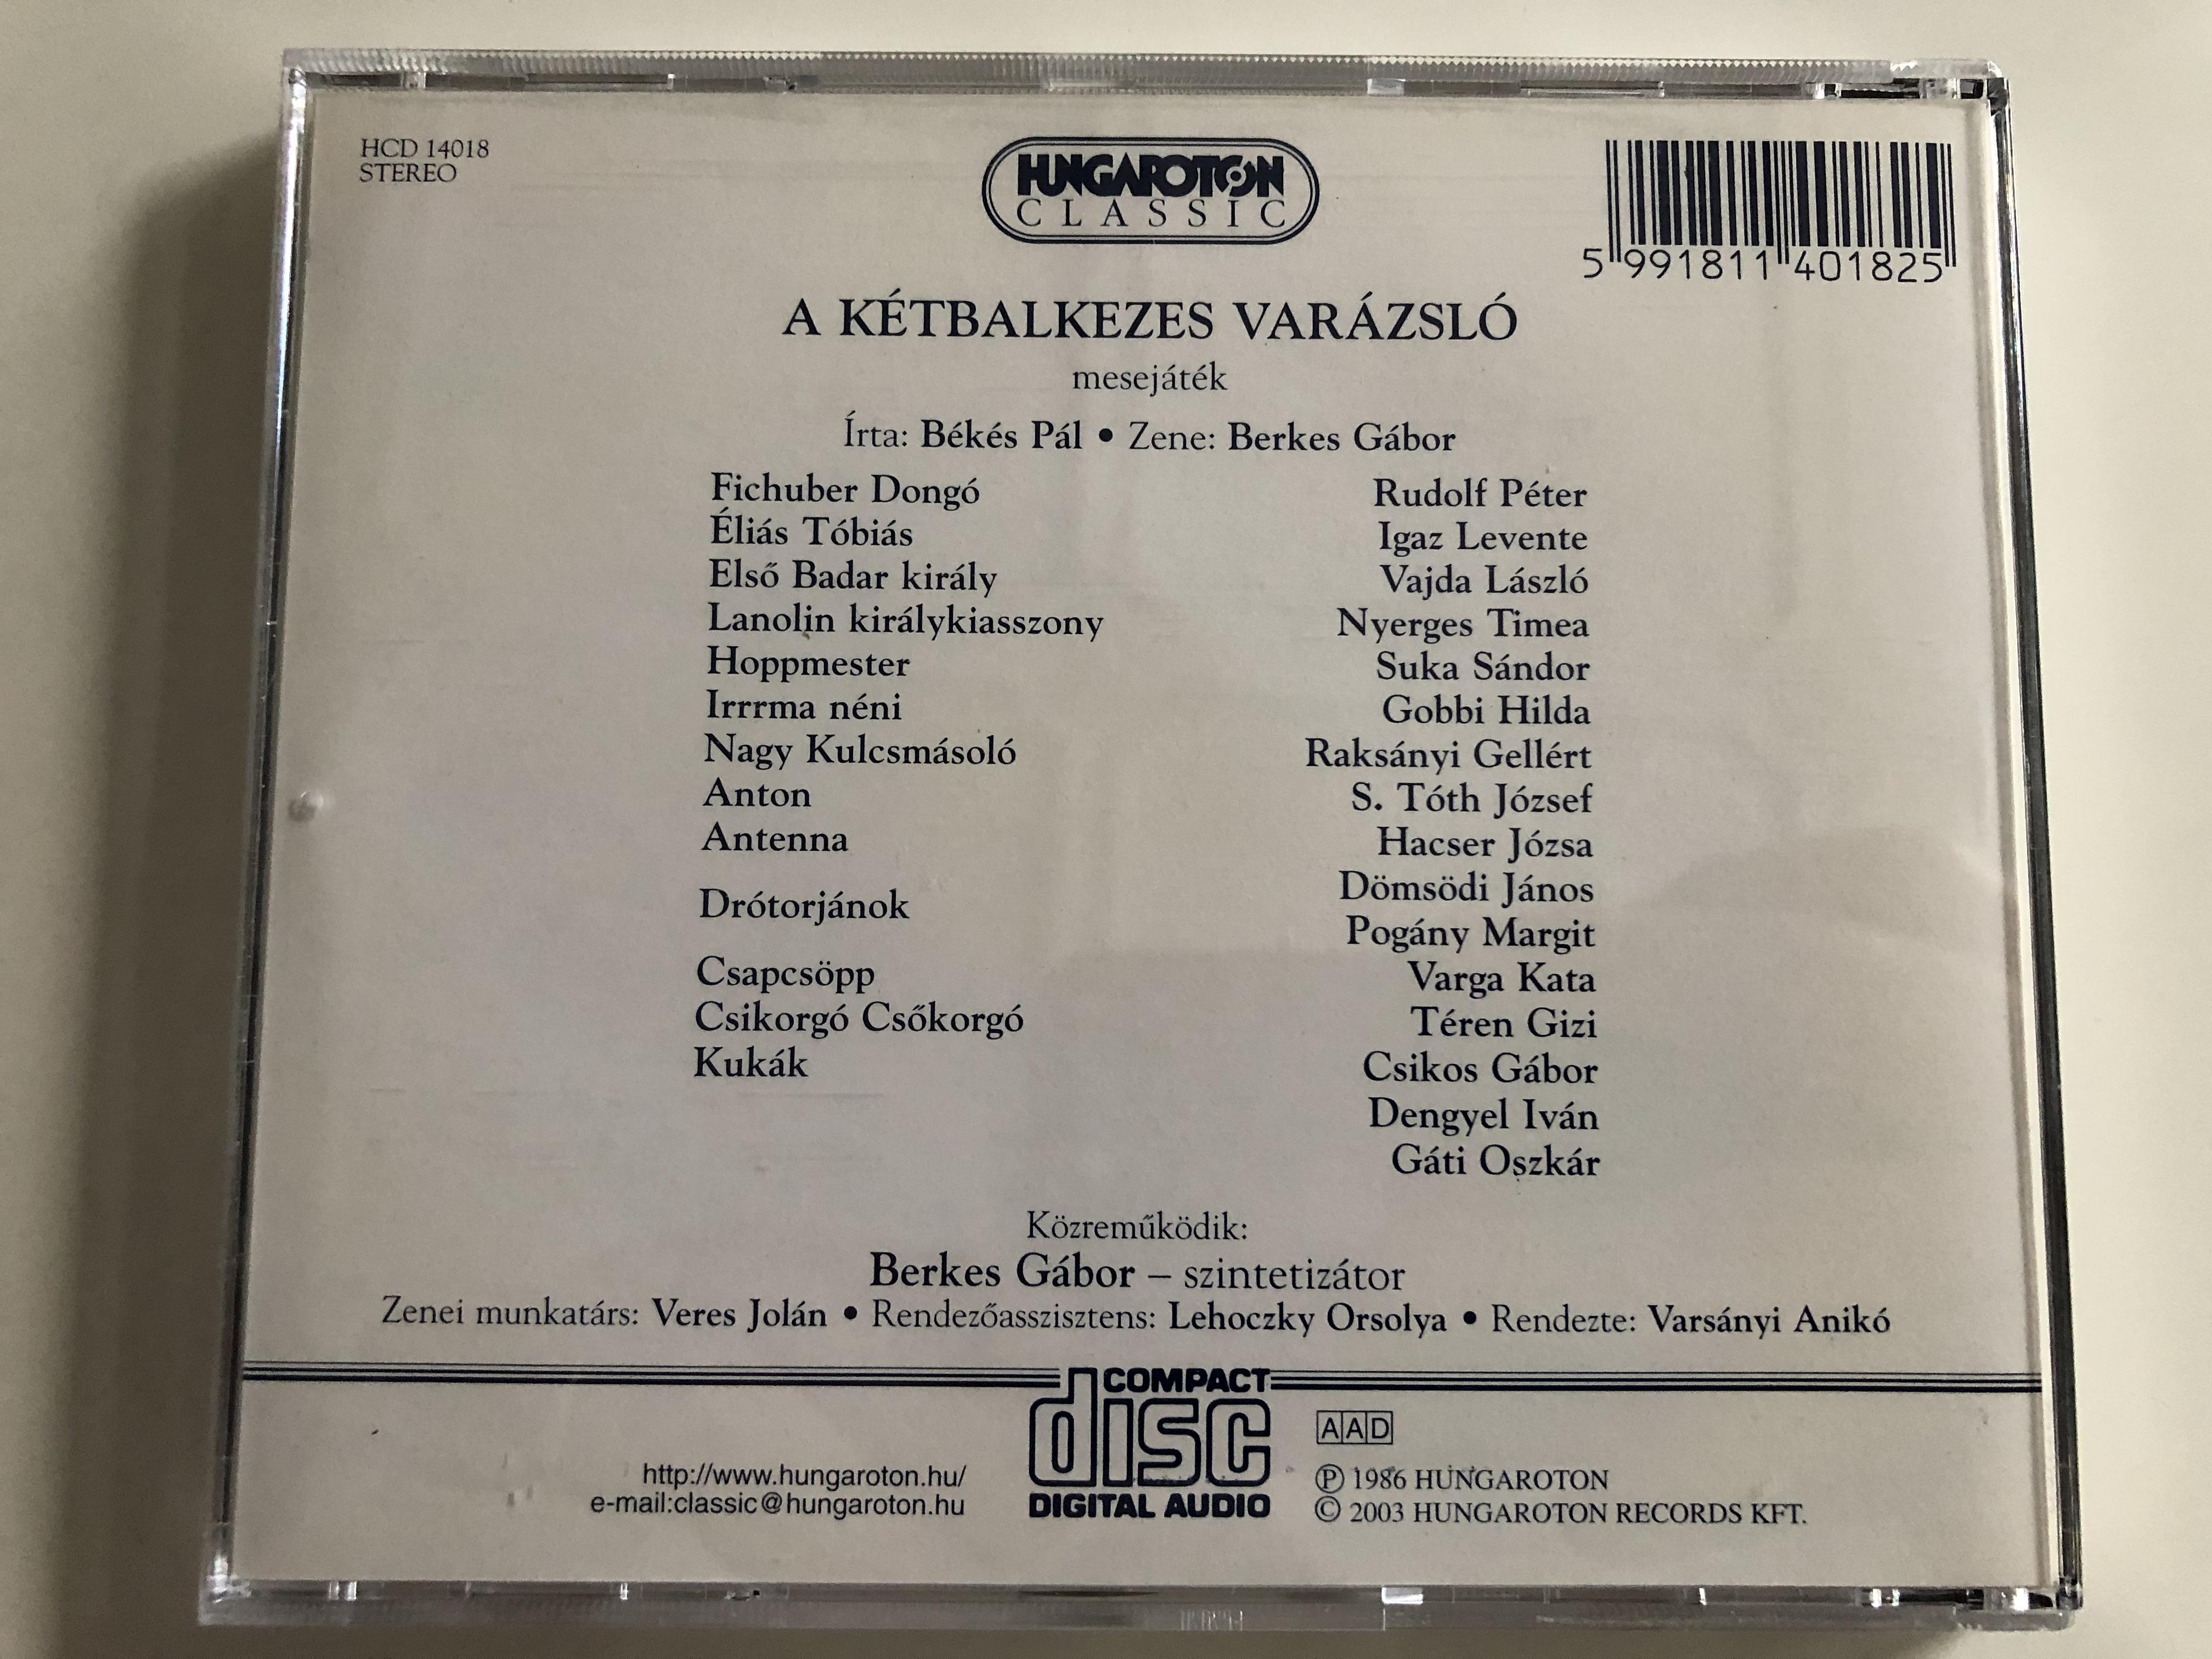 a-k-tbalkezes-var-zsl-b-k-s-p-l-mesej-t-ka-the-clumsy-magician-hungarian-radioplay-for-children-music-by-berkes-g-bor-hungaroton-classic-audio-cd-2003-hcd-14018-4-.jpg